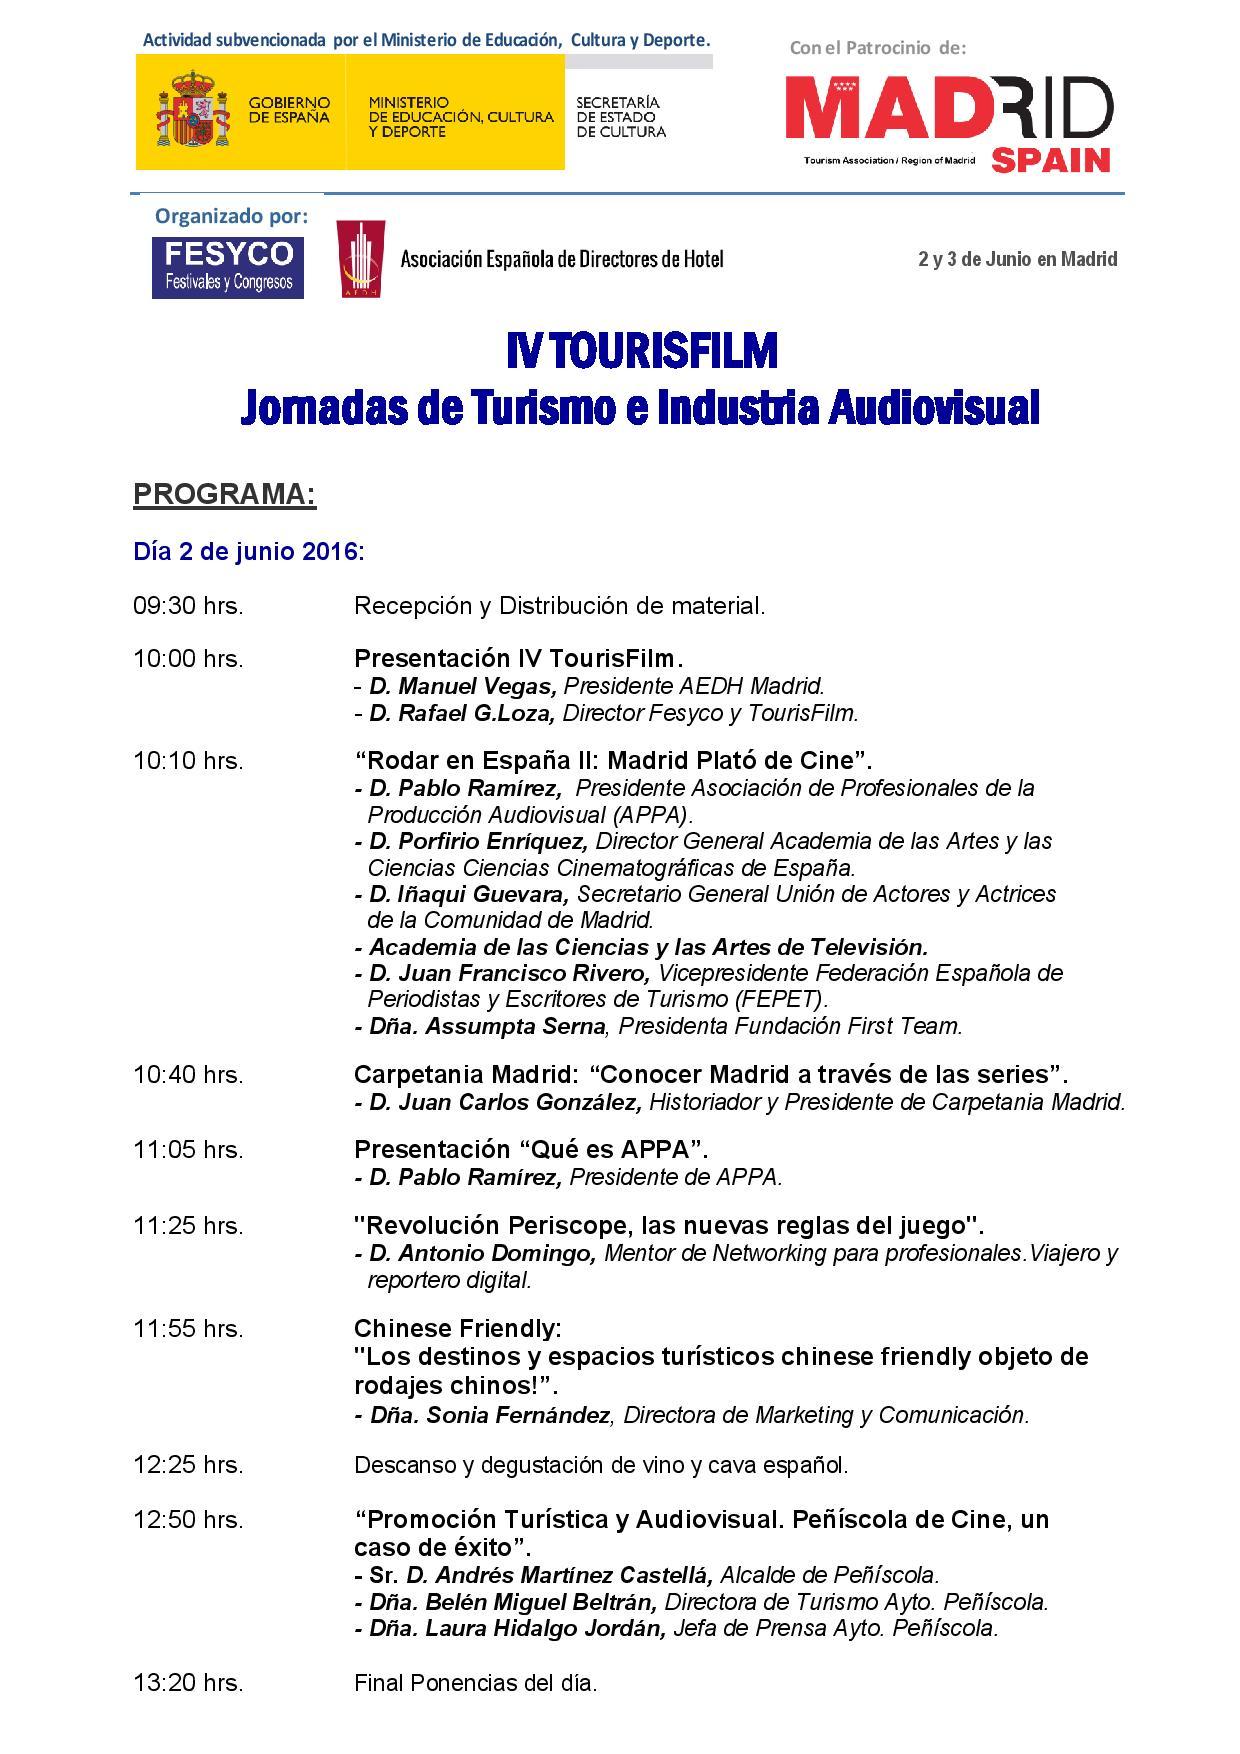 Programa IV TOURISFILM1